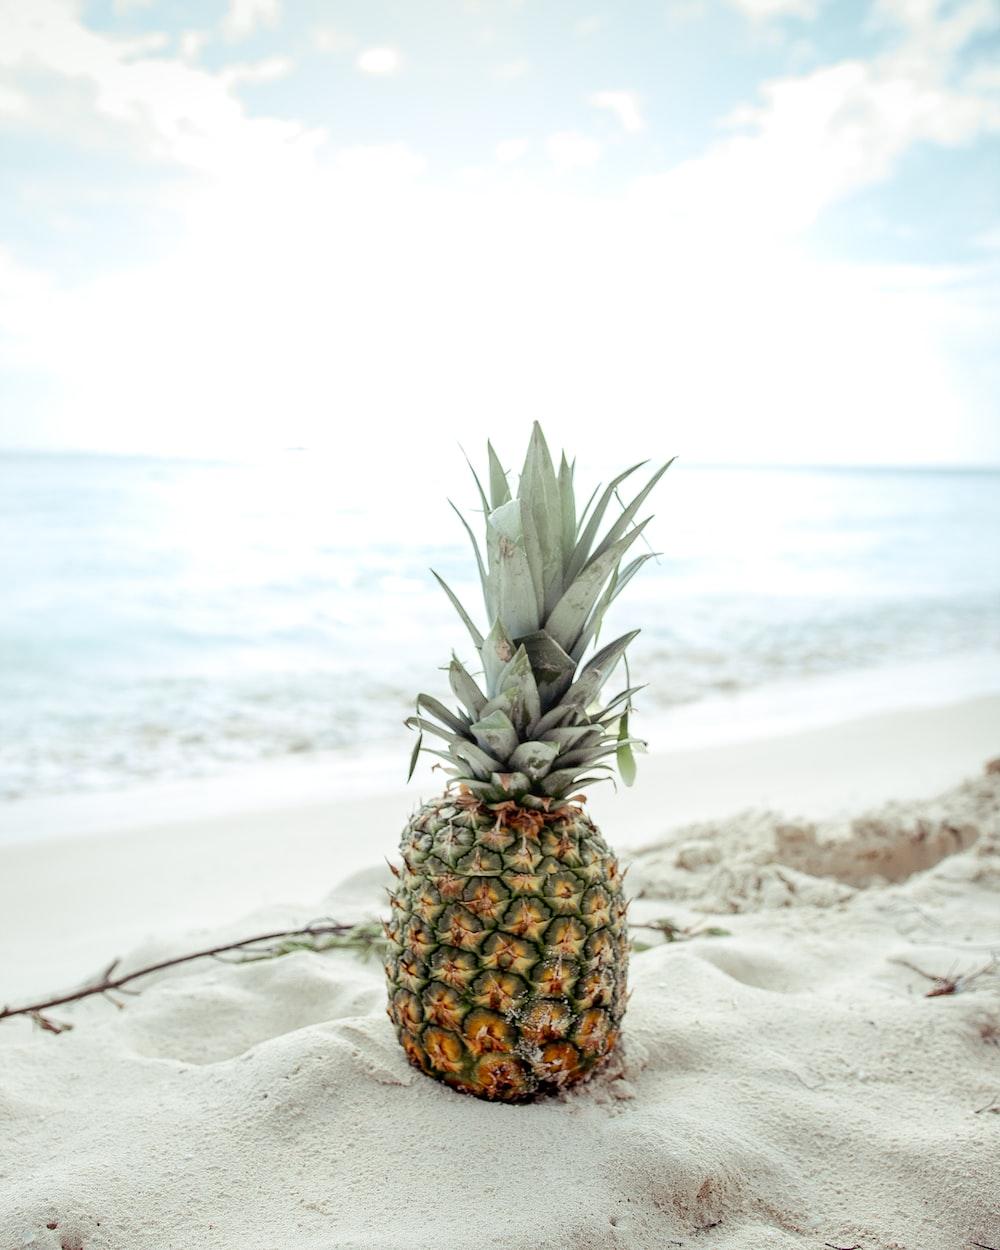 pineapple fruit on the sand